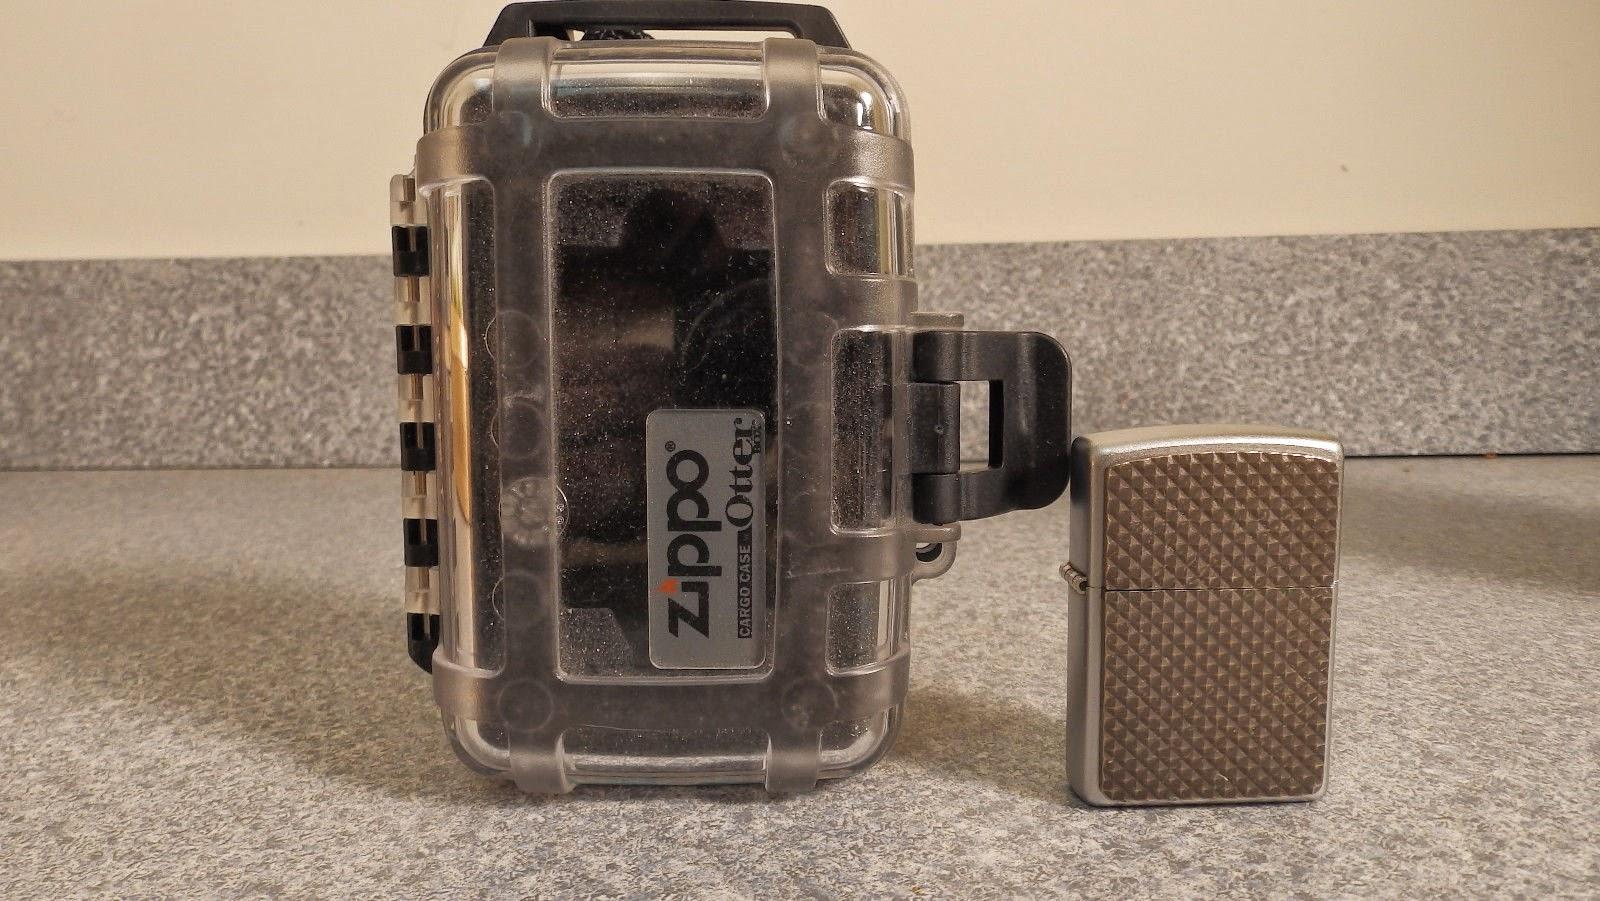 http://www.ebay.com/itm/Vintage-Collectible-Zippo-Cargo-Case-By-Otter-Box-/321684724414?pt=LH_DefaultDomain_0&hash=item4ae5e75abe